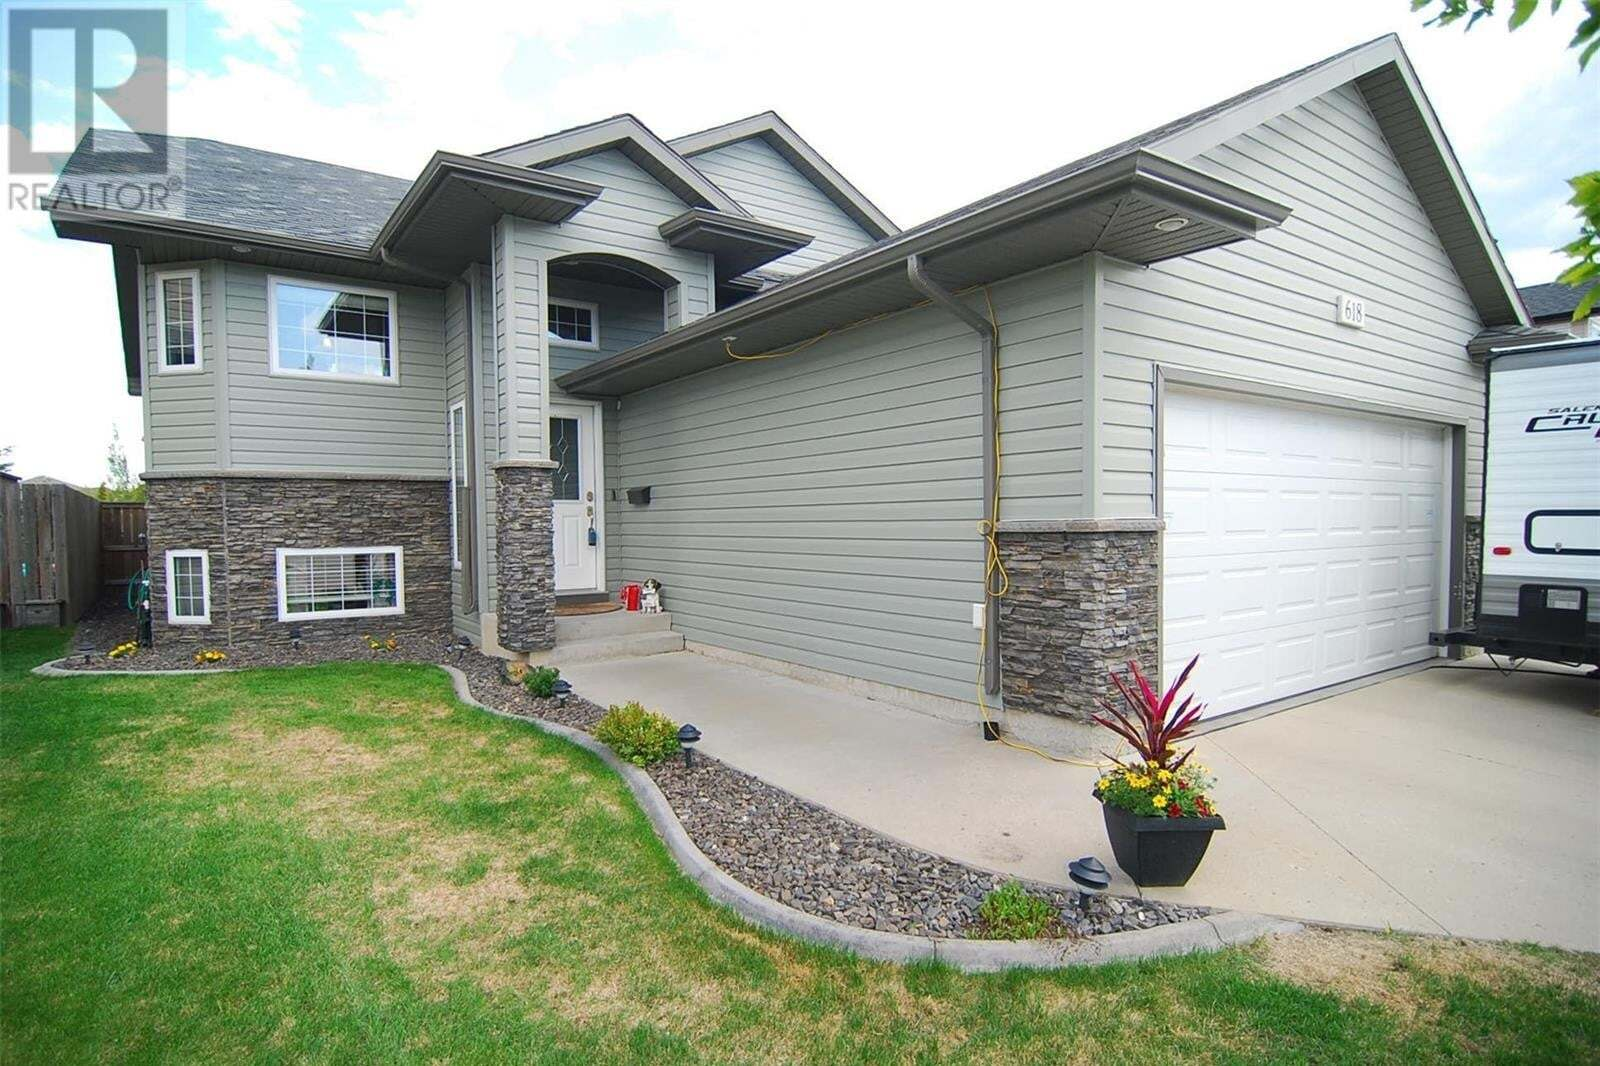 House for sale at 618 Lynd Cres Saskatoon Saskatchewan - MLS: SK809551